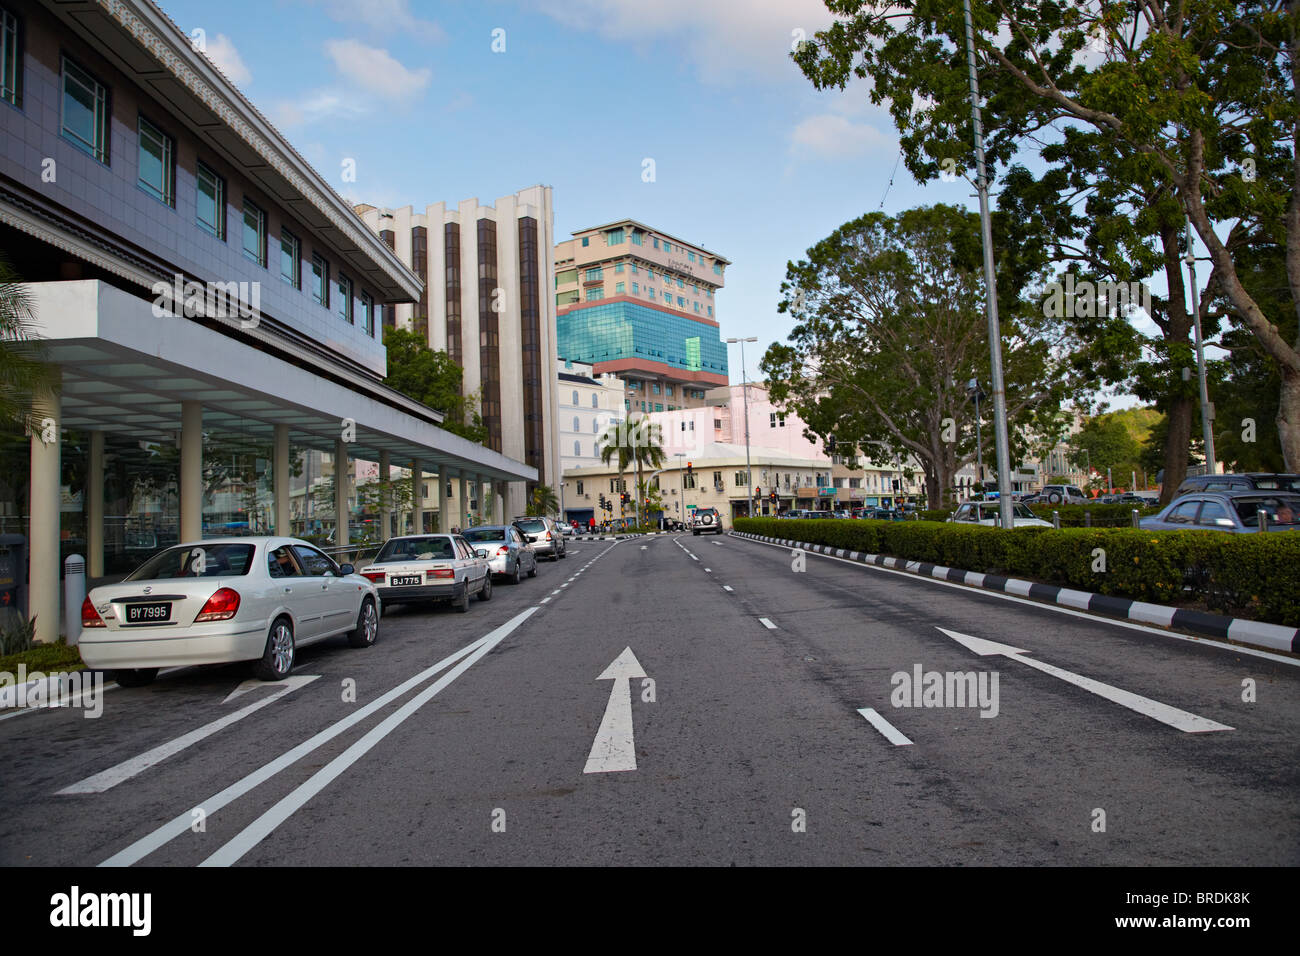 Jalan Mac Arthur, Bandar Seri Begawan, Brunei - Stock Image